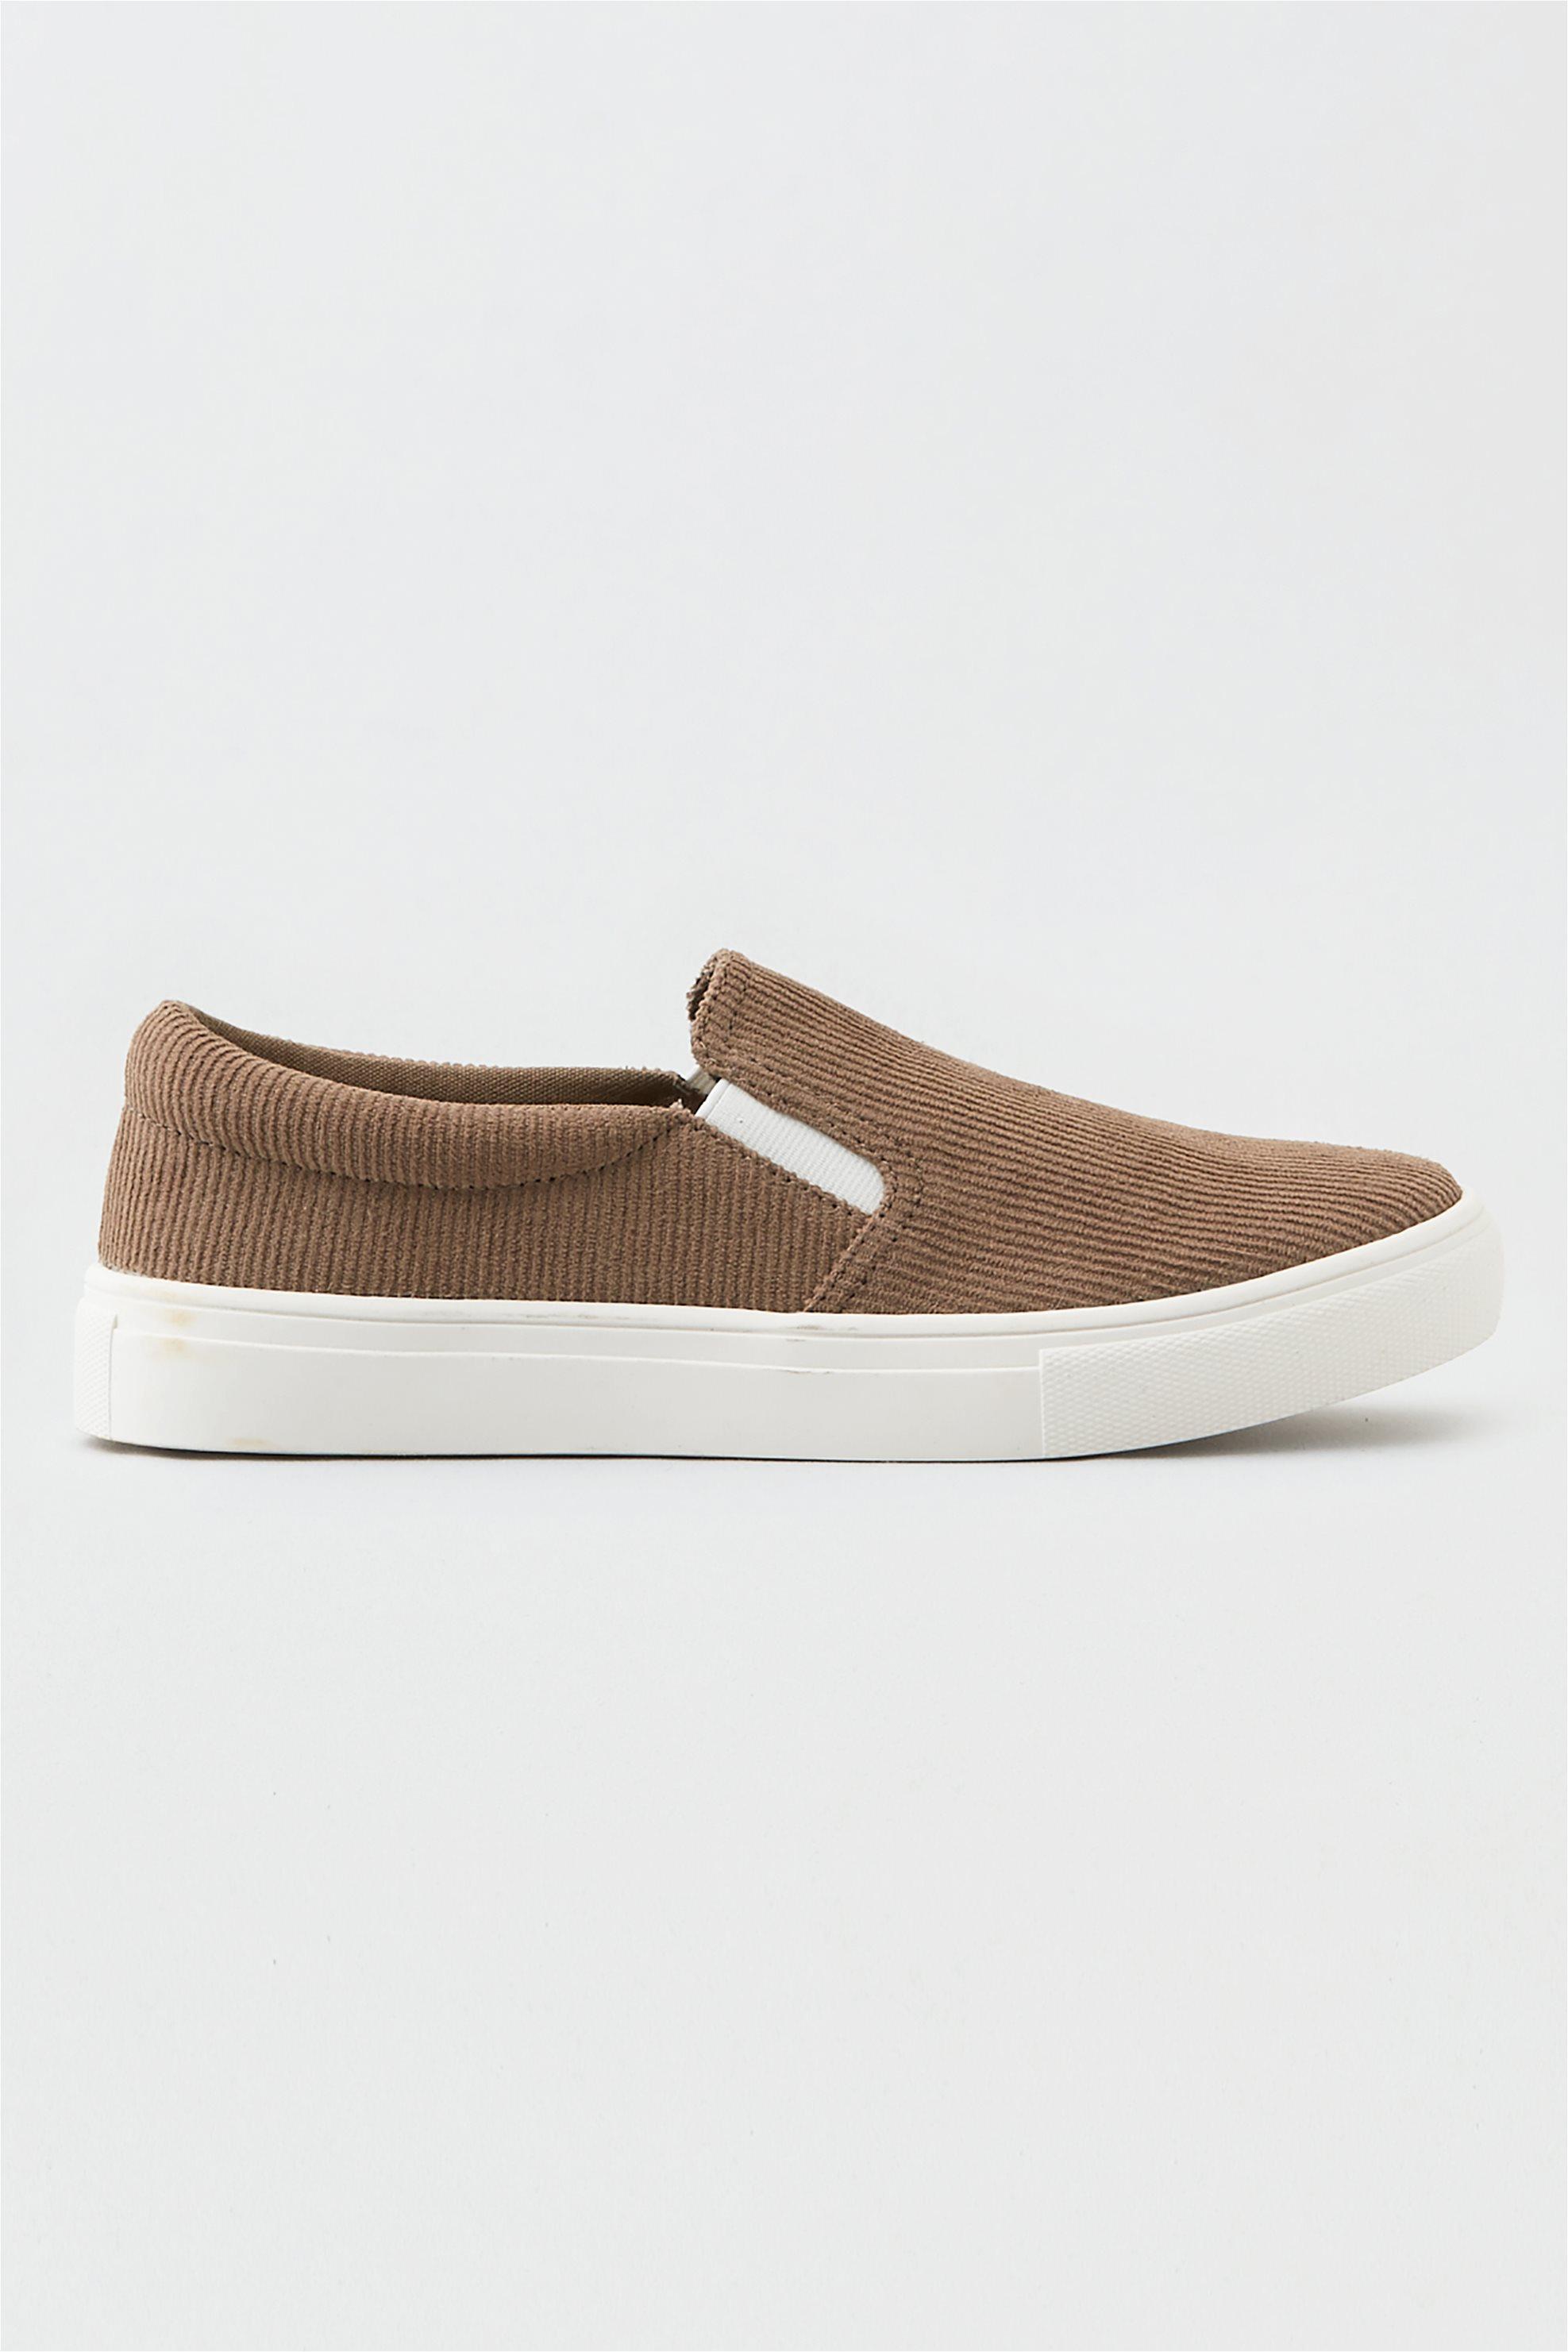 AEO Slip On Sneaker - 0414-4396-256 - Καφέ